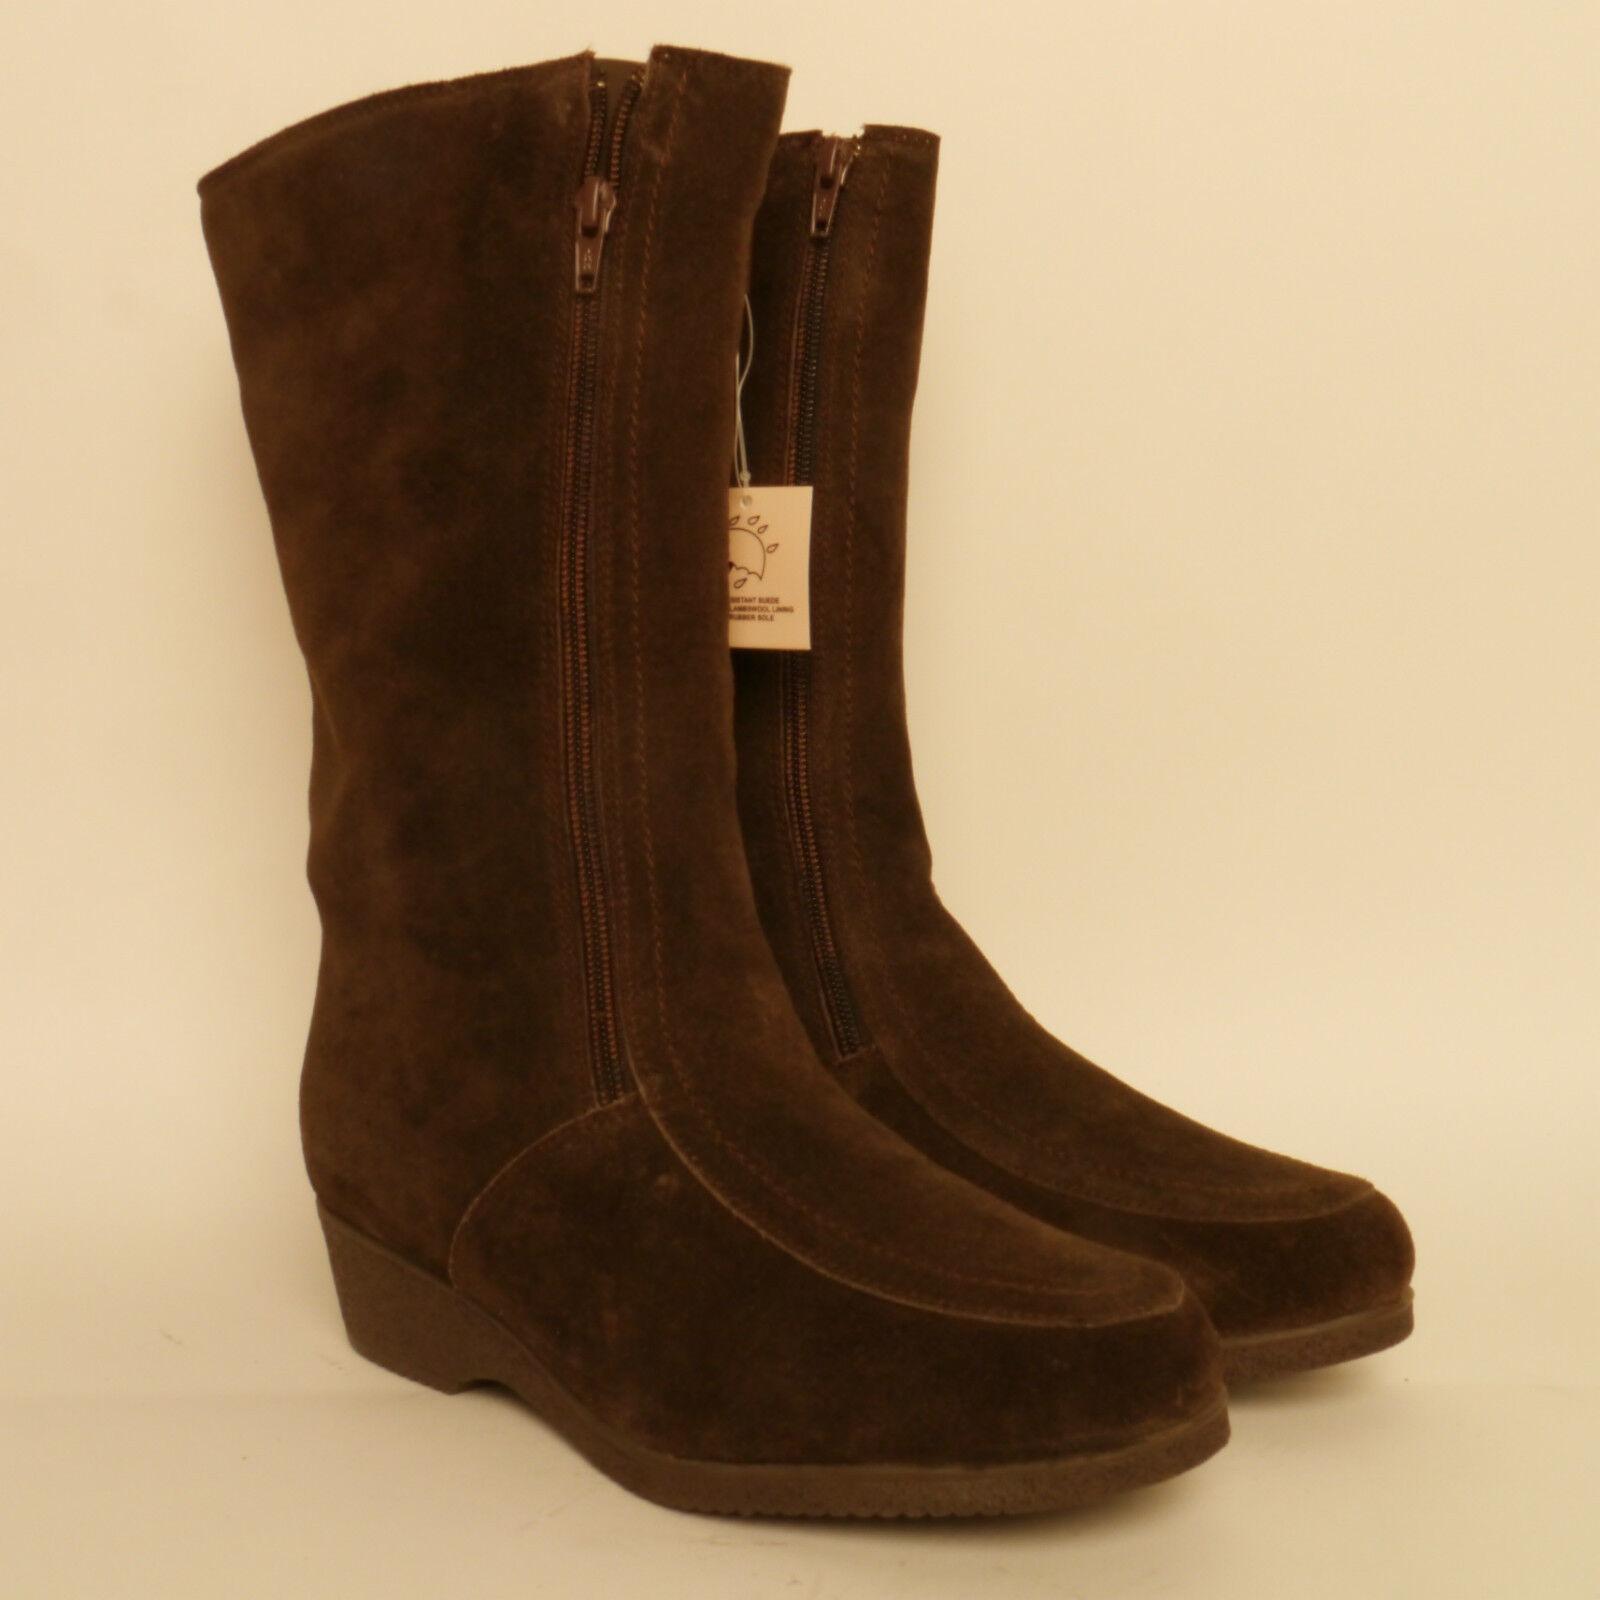 Zapatos especiales con descuento Draper Of Glastonbury High Brown Suede Boots Sheepskin Lined Bargain 59.99